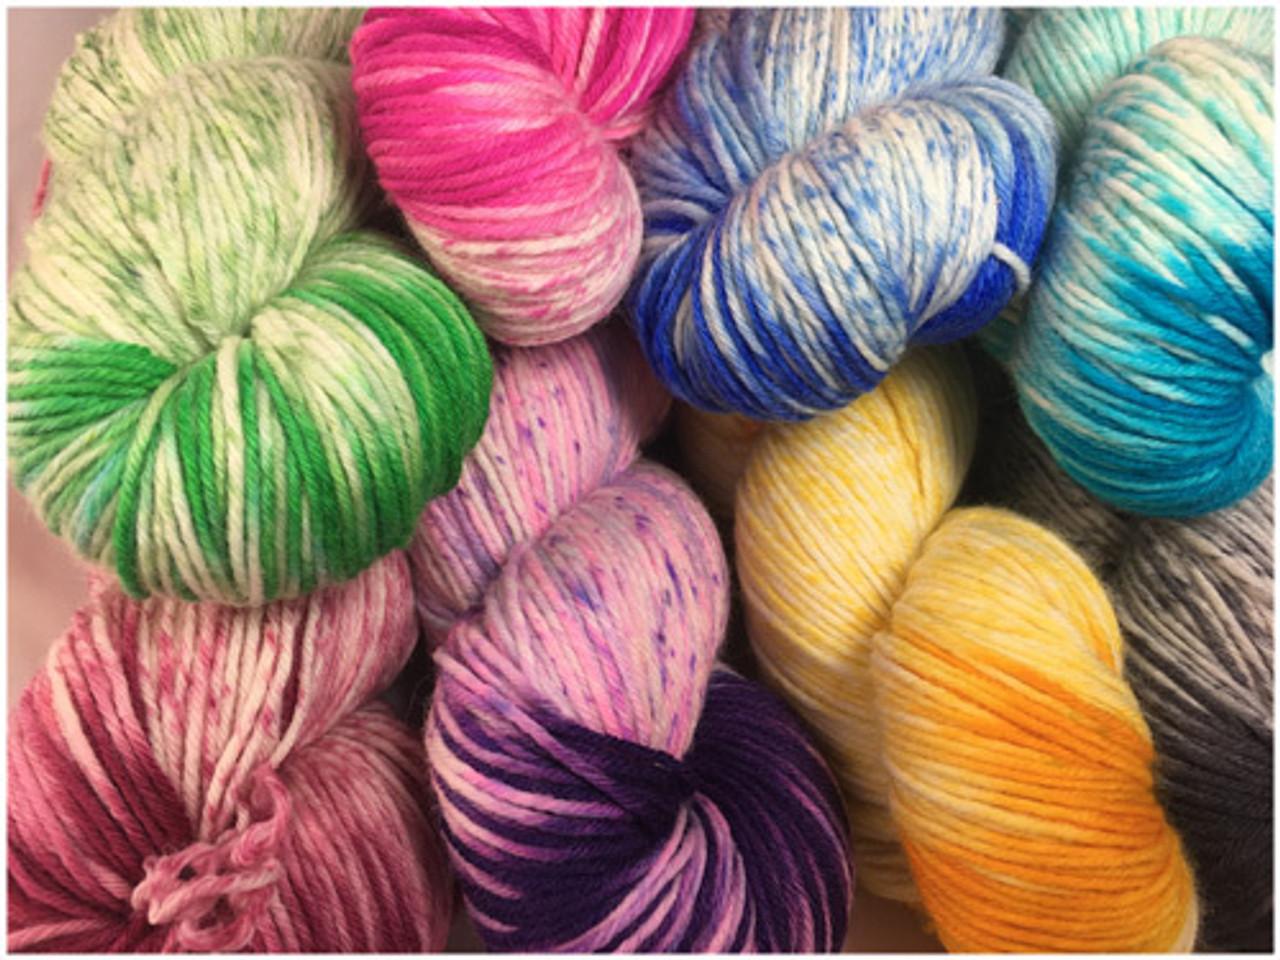 Araucania Yarn - Huasco Color | Angelika's Yarn Store